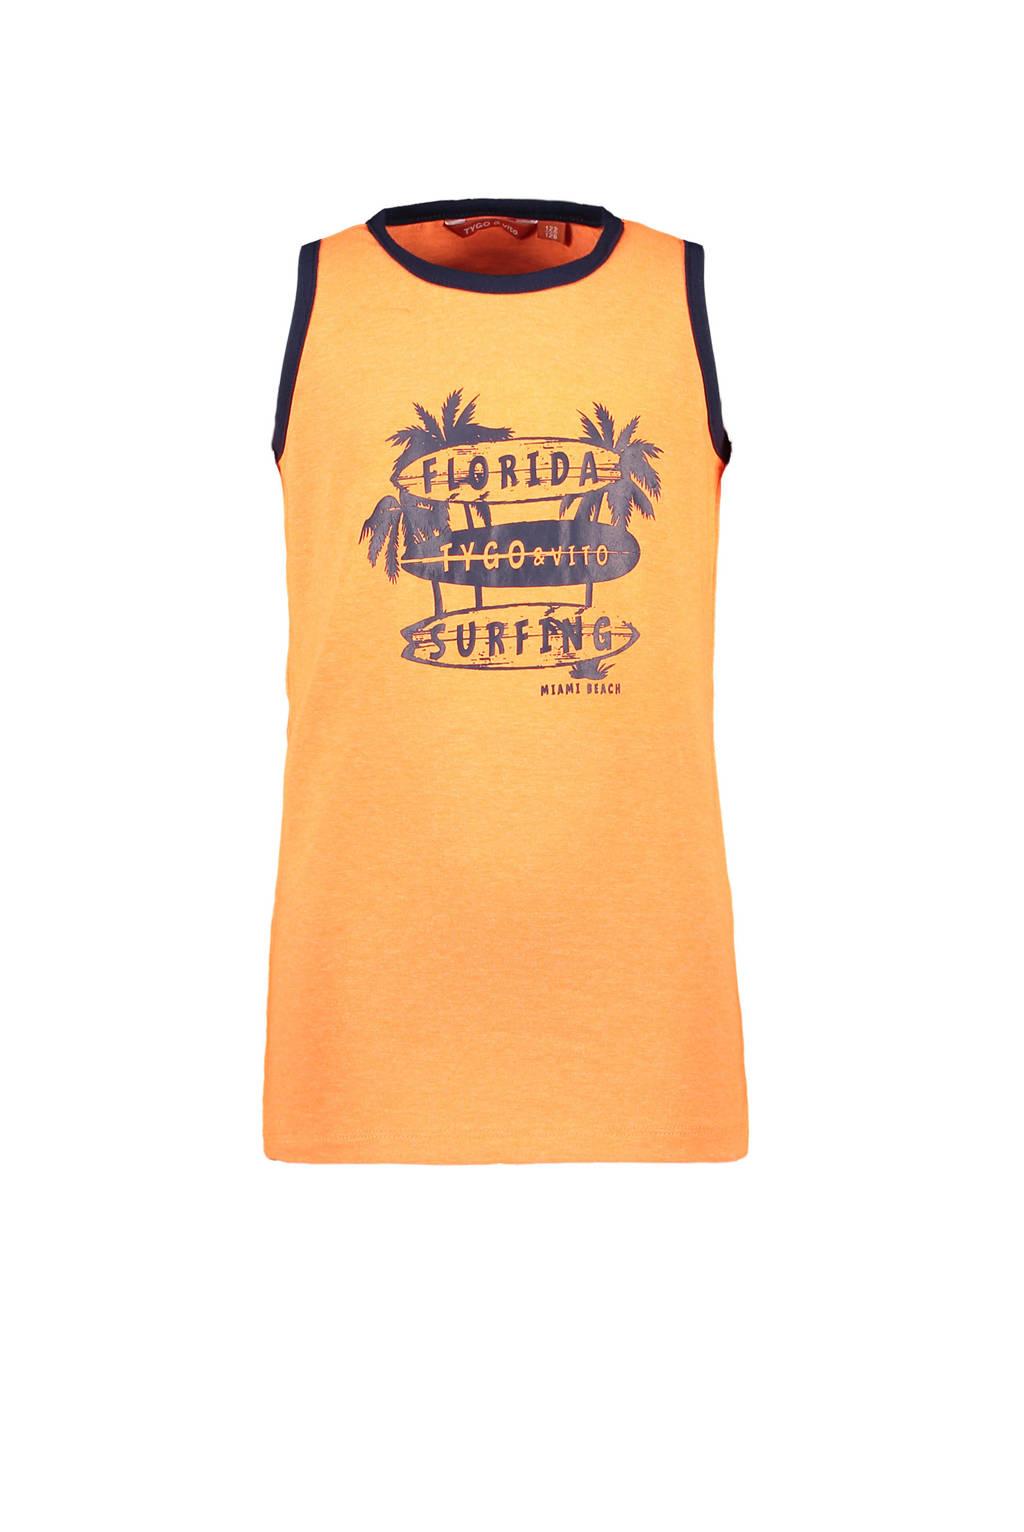 TYGO & vito T-shirt met biologisch katoen oranje, Oranje